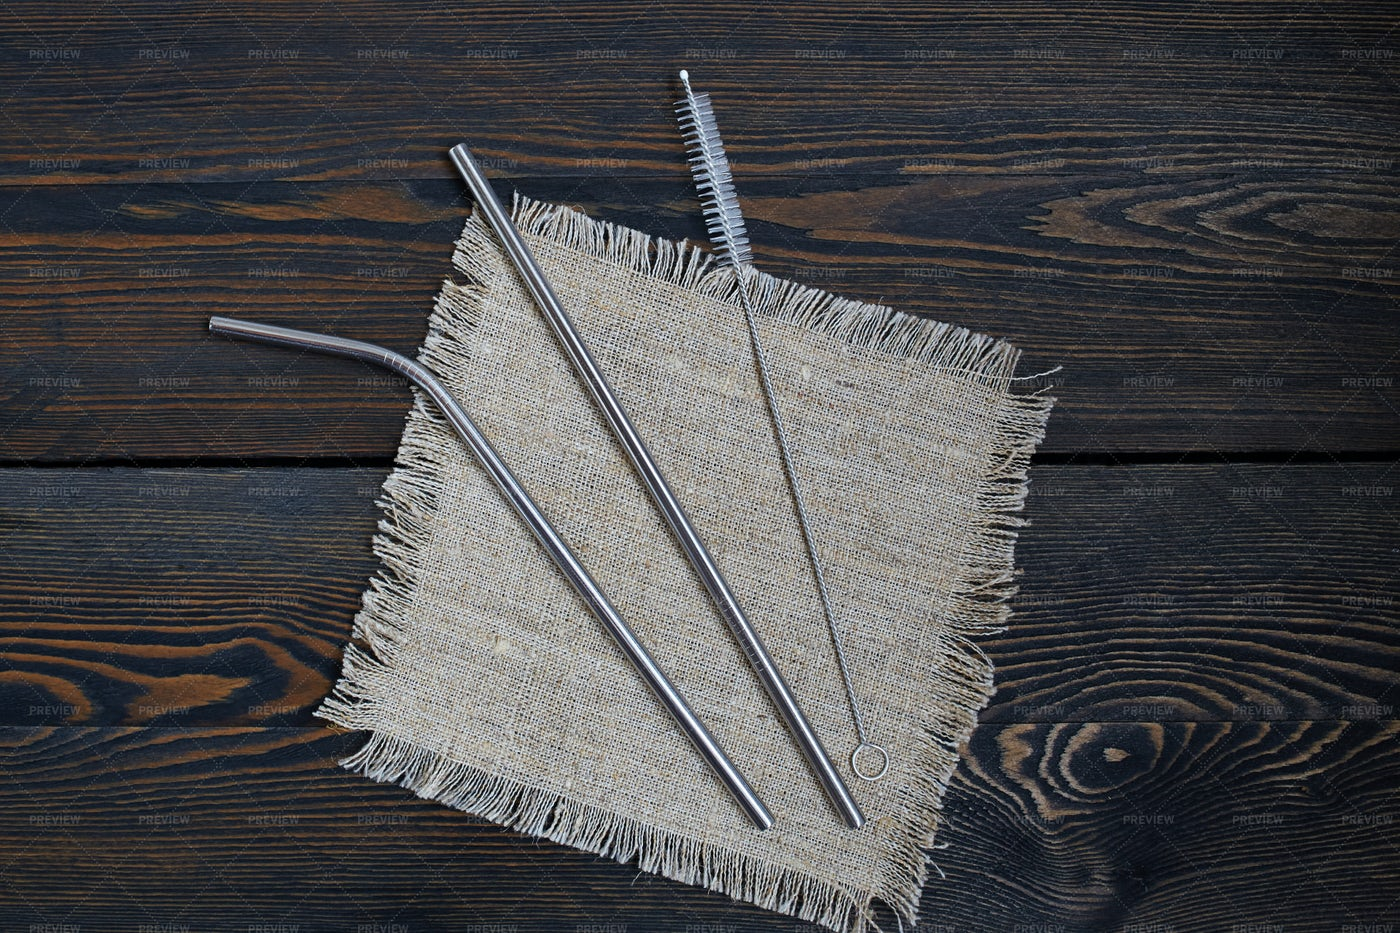 Eco-Friendly Stainless Steel Straws: Stock Photos